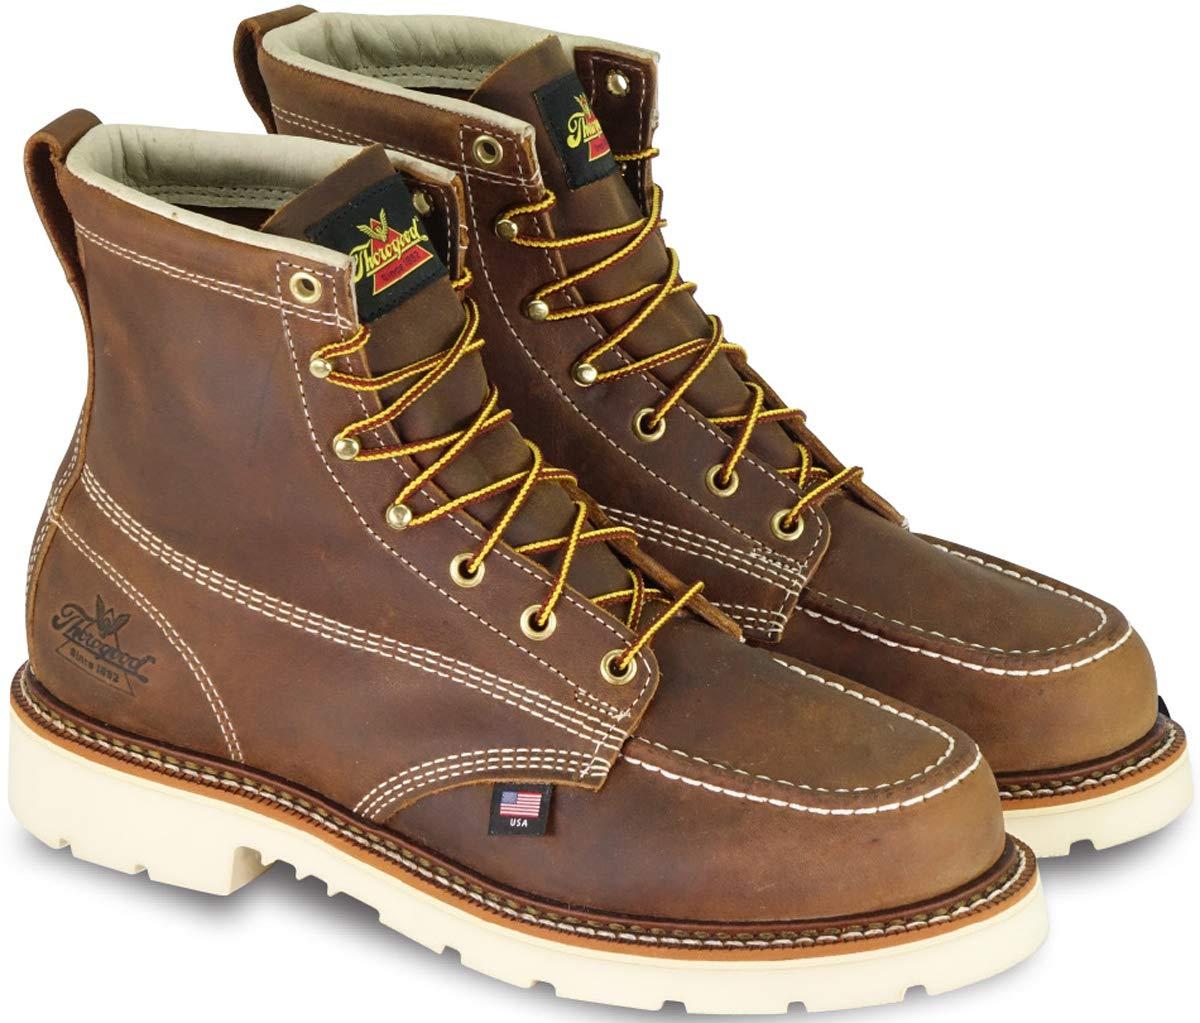 Thorogood 804-4375 Men's American Heritage 6'' Moc Toe, MAXWear 90 Safety Toe Boot, Trail Crazyhorse - 11.5 D(M) US